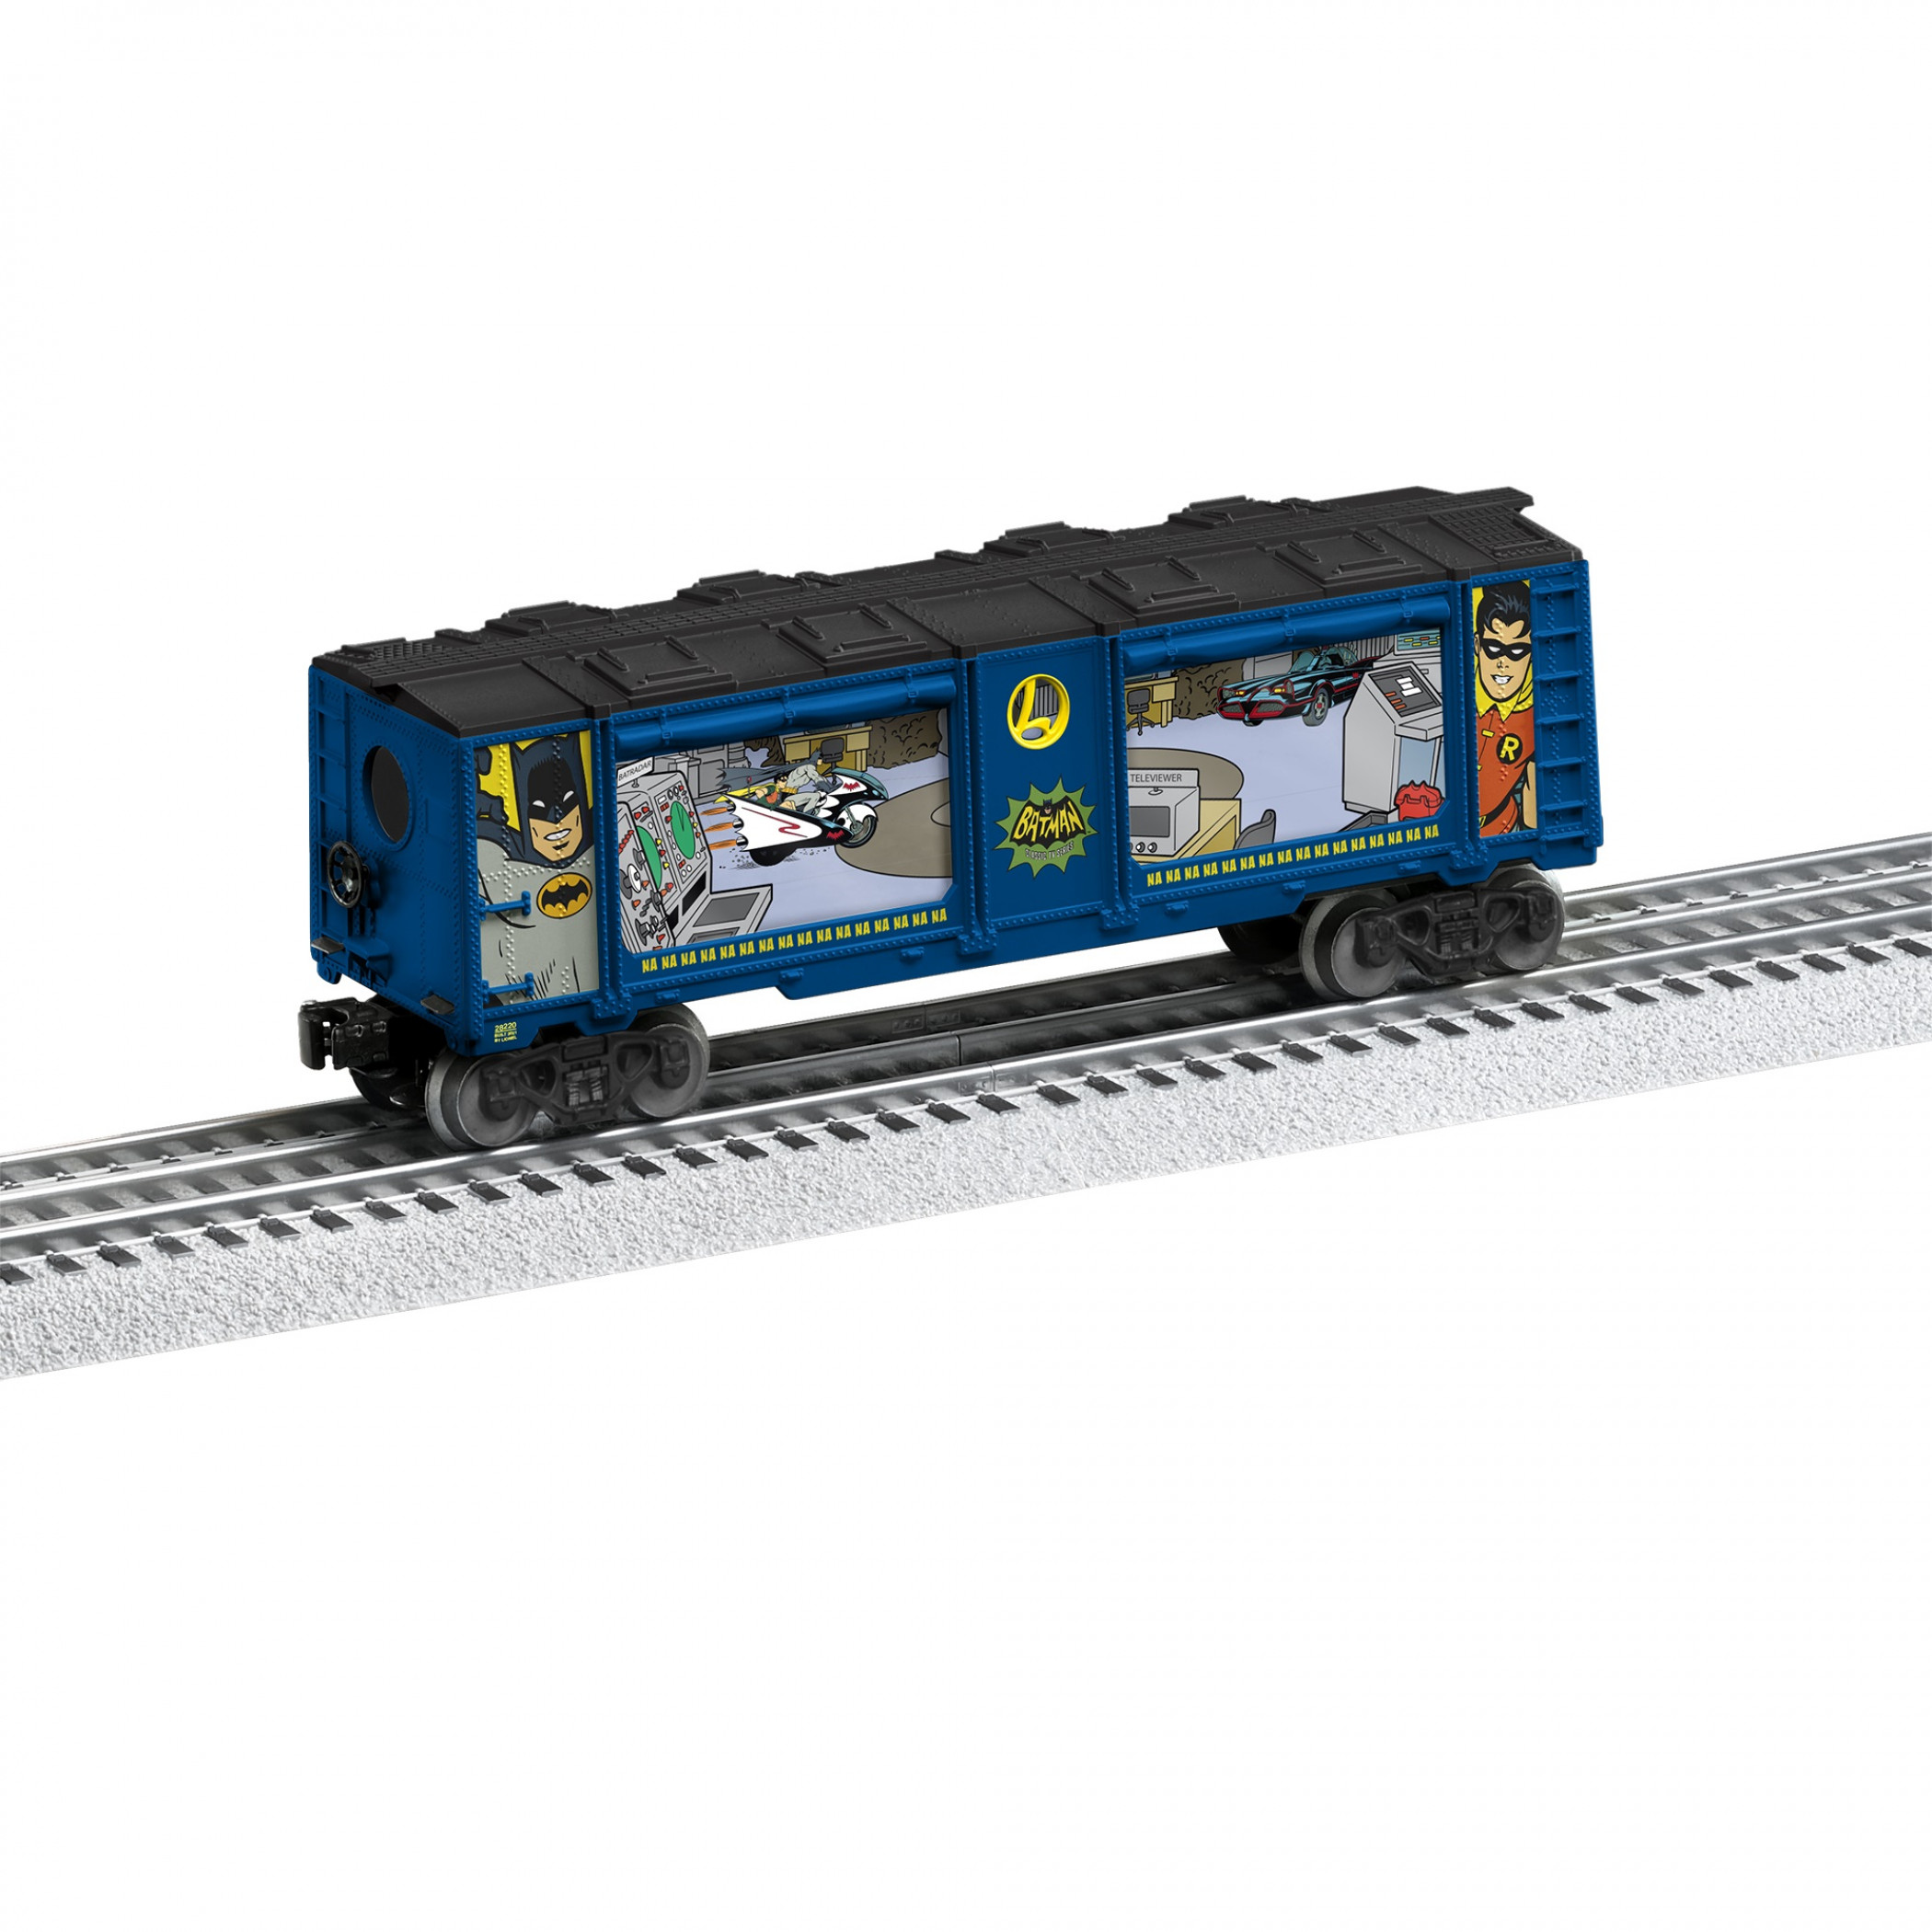 Batman Aquarium Lionel Train Car